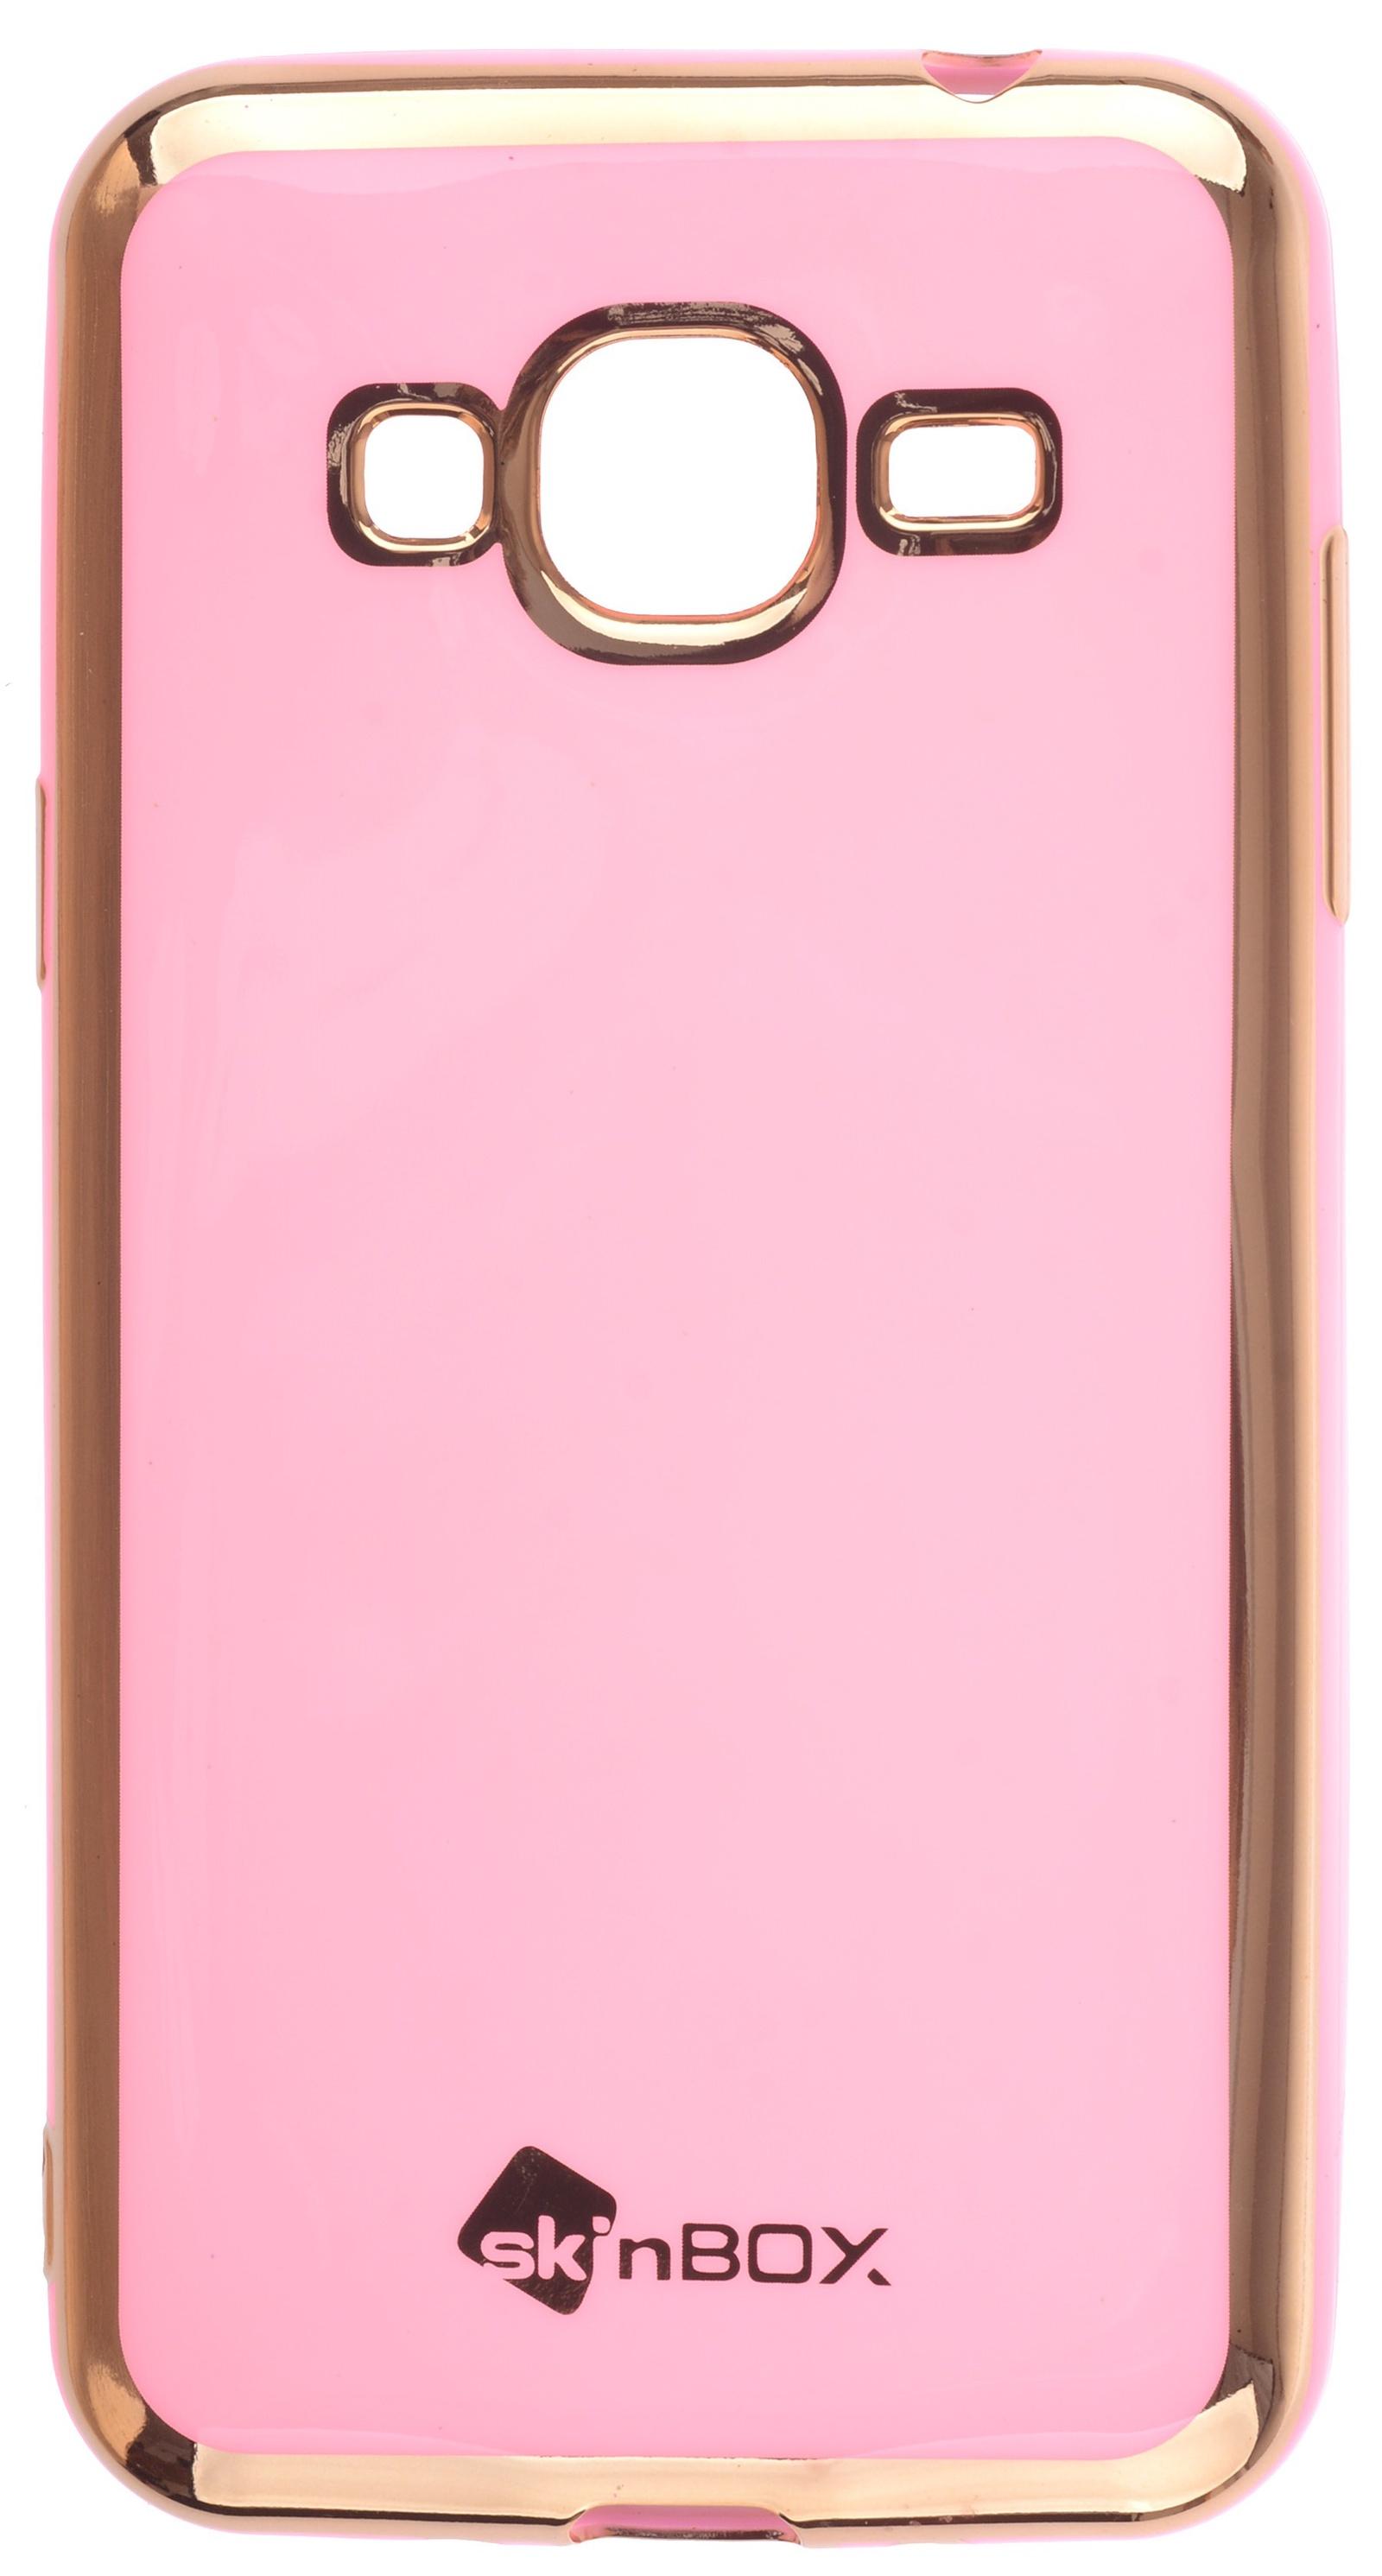 Накладка Skinbox slim silicone color для Samsung Galaxy J3 (2016), 2000000135519, пудра skinbox накладка skinbox slim silicone для samsung galaxy note 7